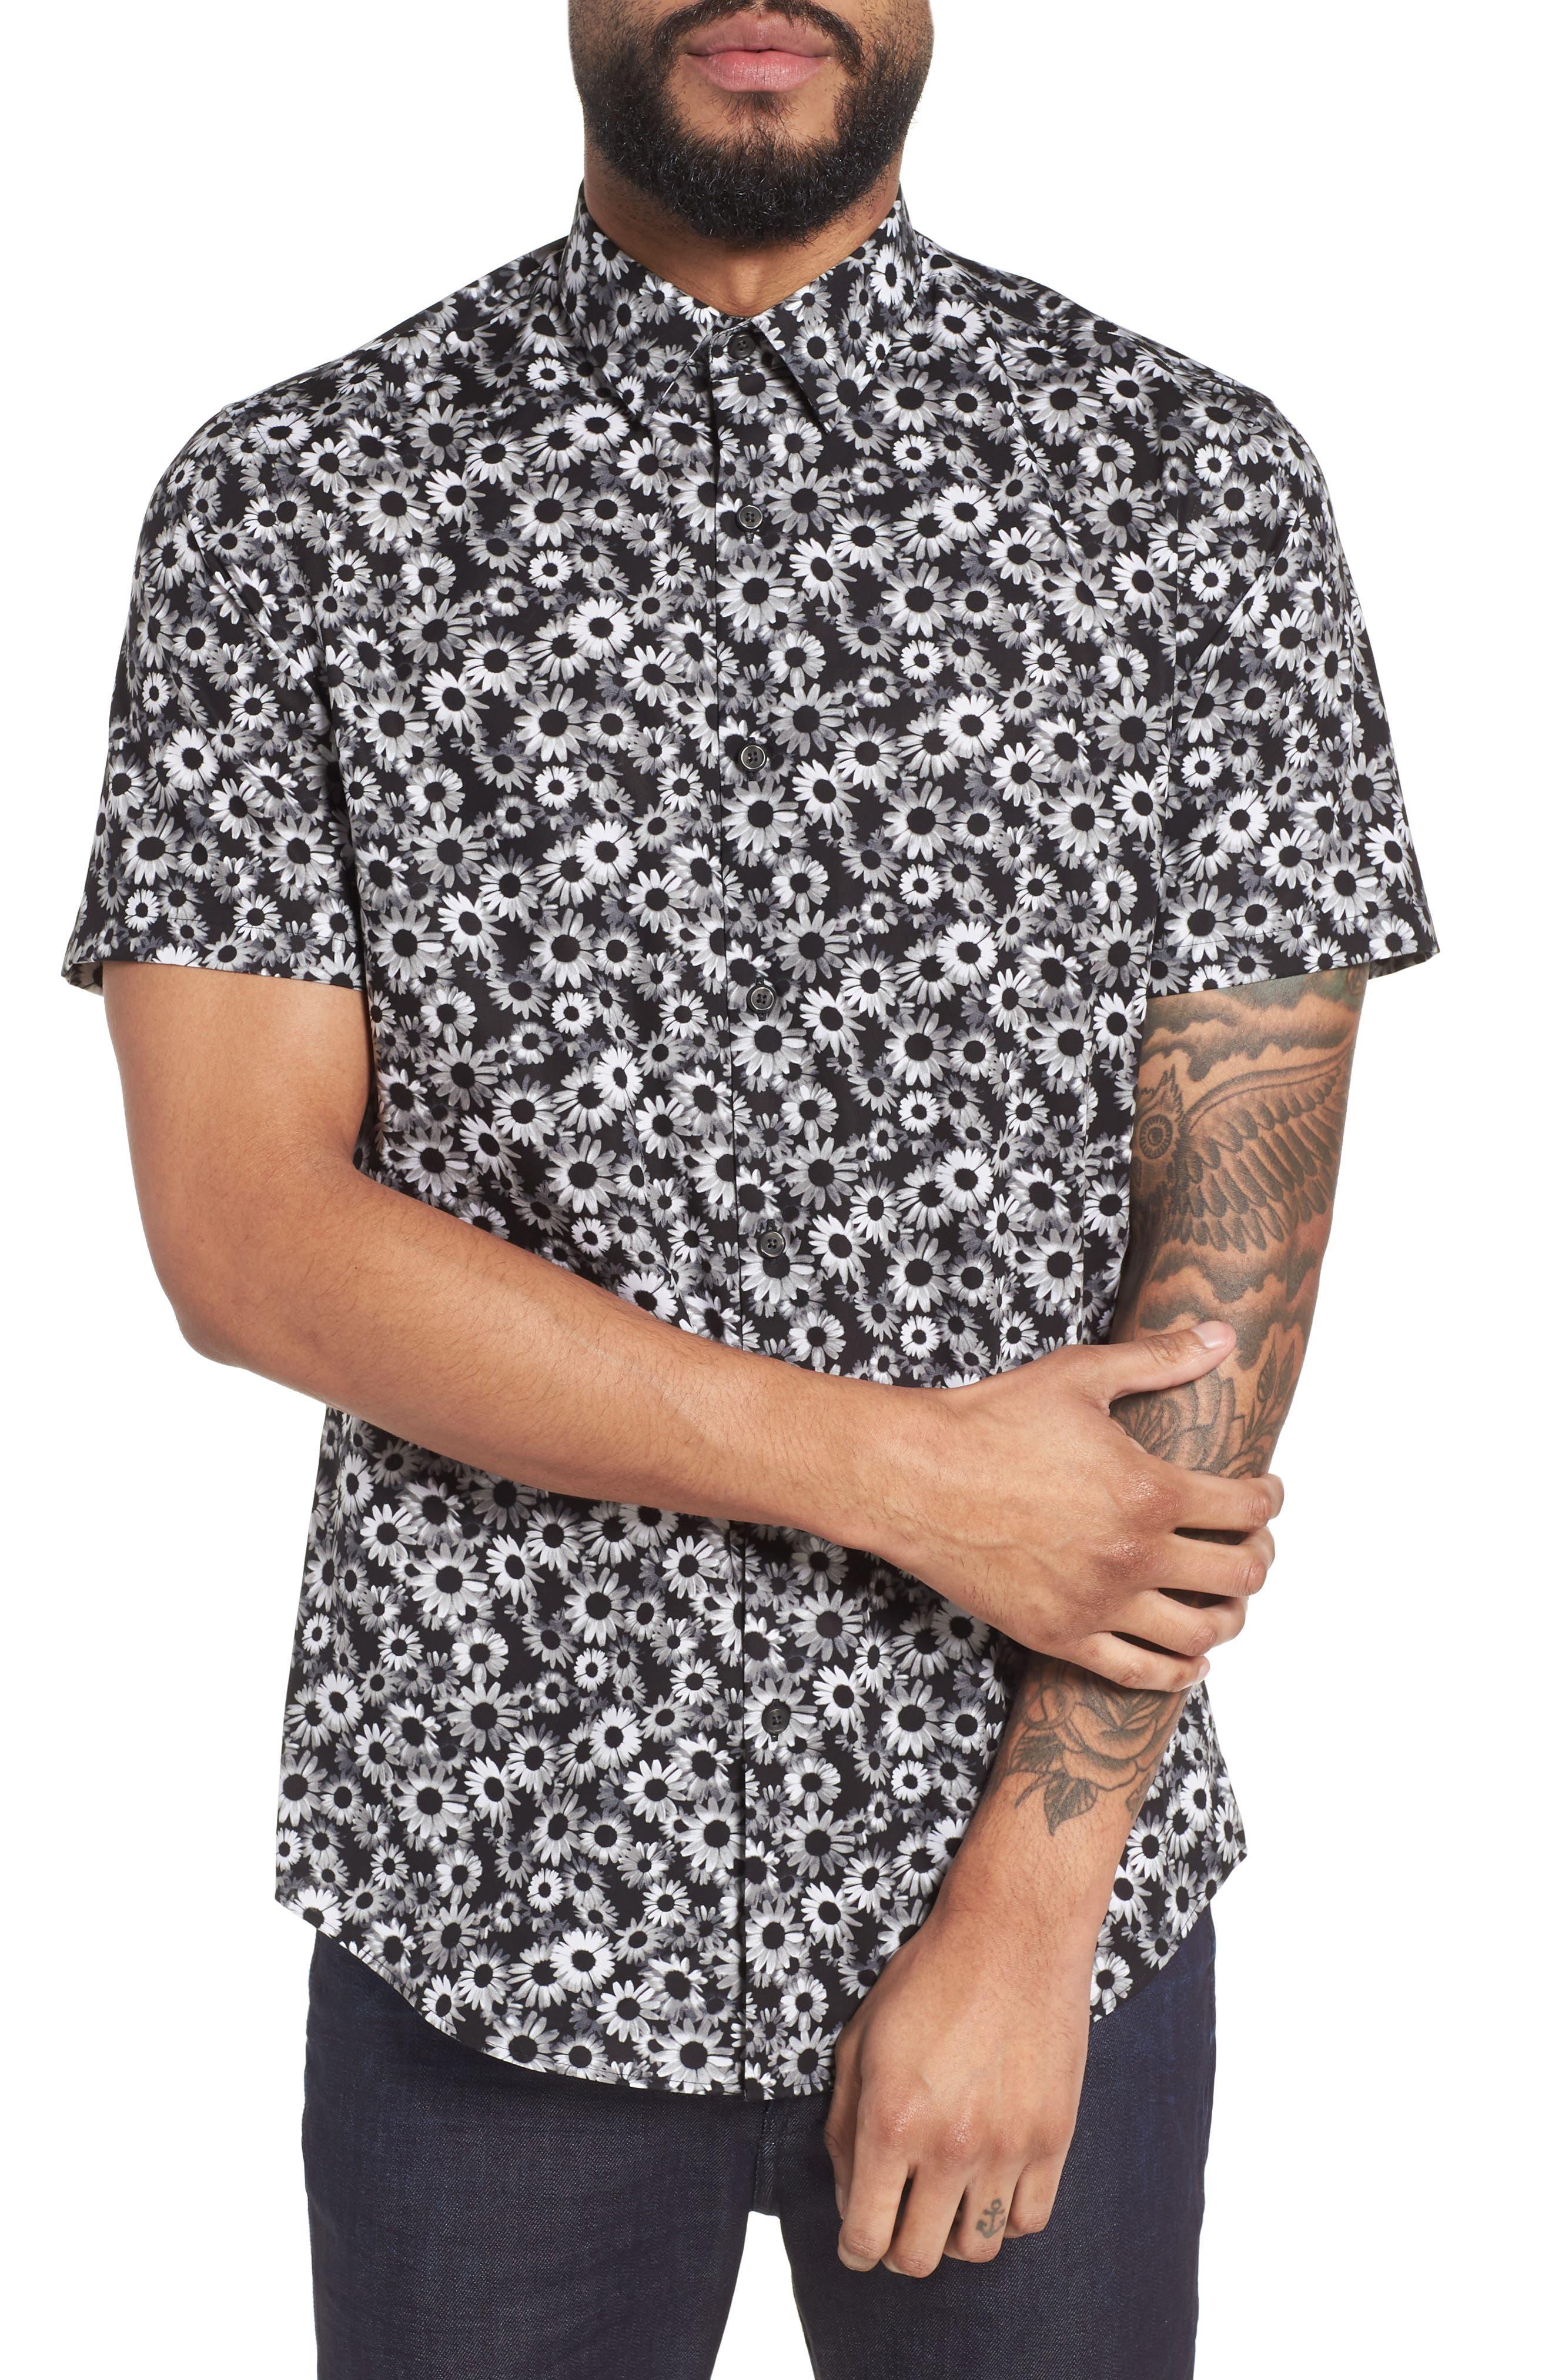 Floral Sport Shirt,                         Main,                         color, Black White Daisy Floral